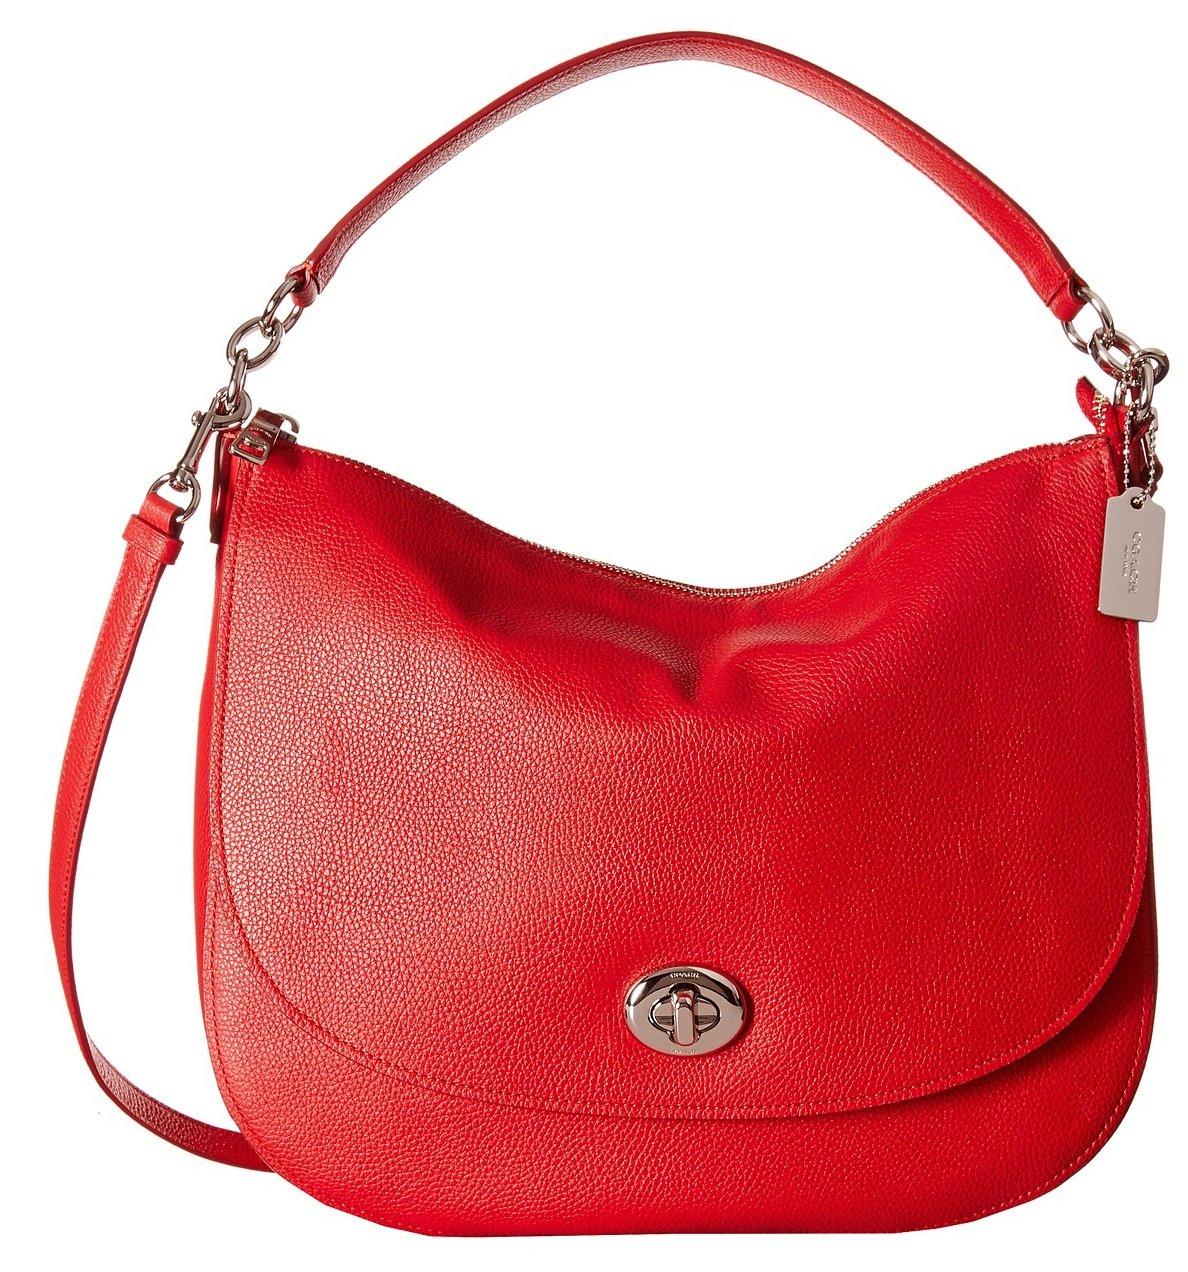 COACH Women's Pebbled Turnlock Hobo SV/True Red Hobo